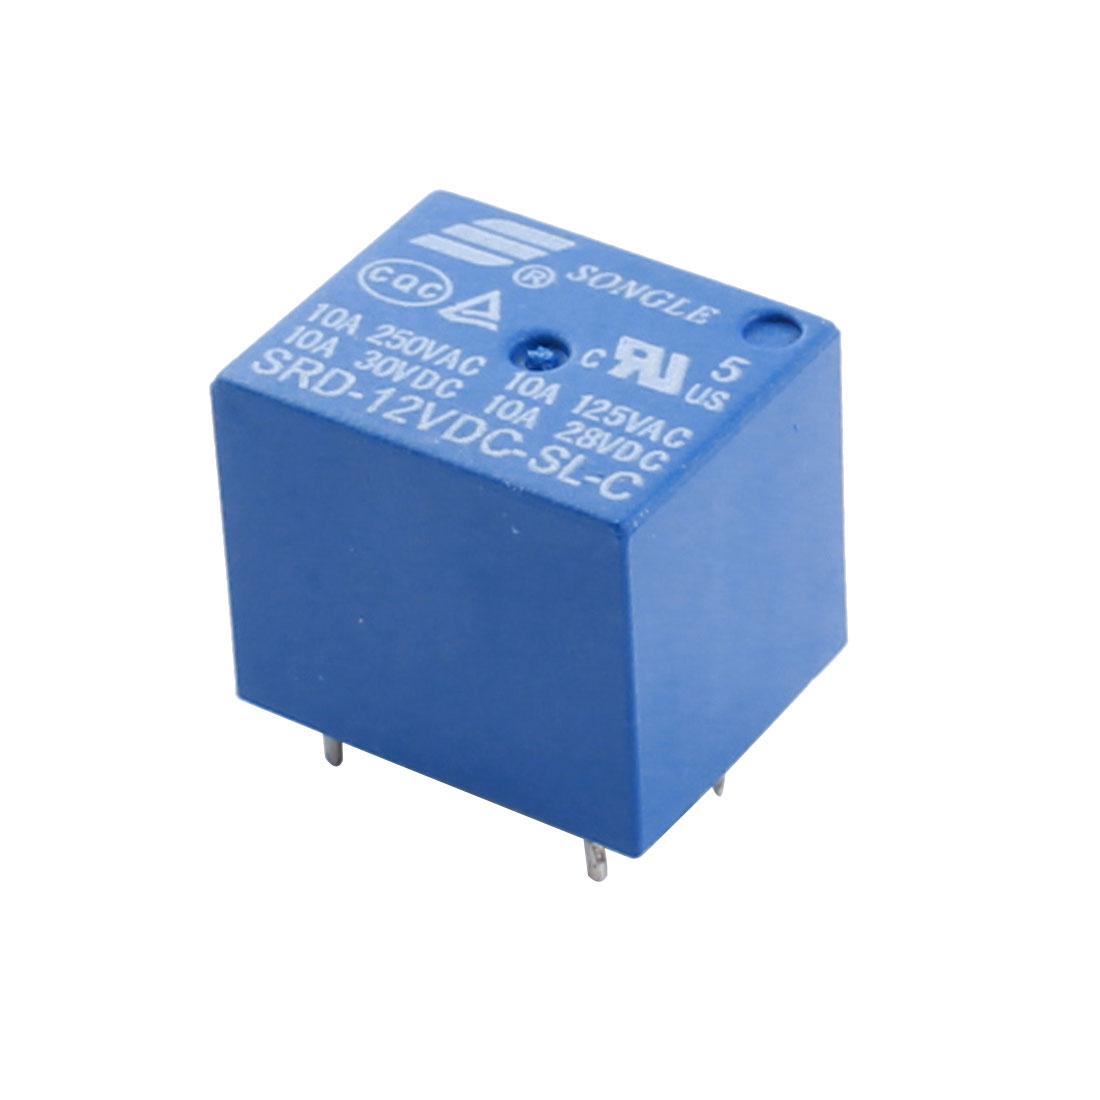 SRD-12VDC-SL-C DC 12V Coil 5 Pin Blue Plastic Housing General Purpose Power Relay